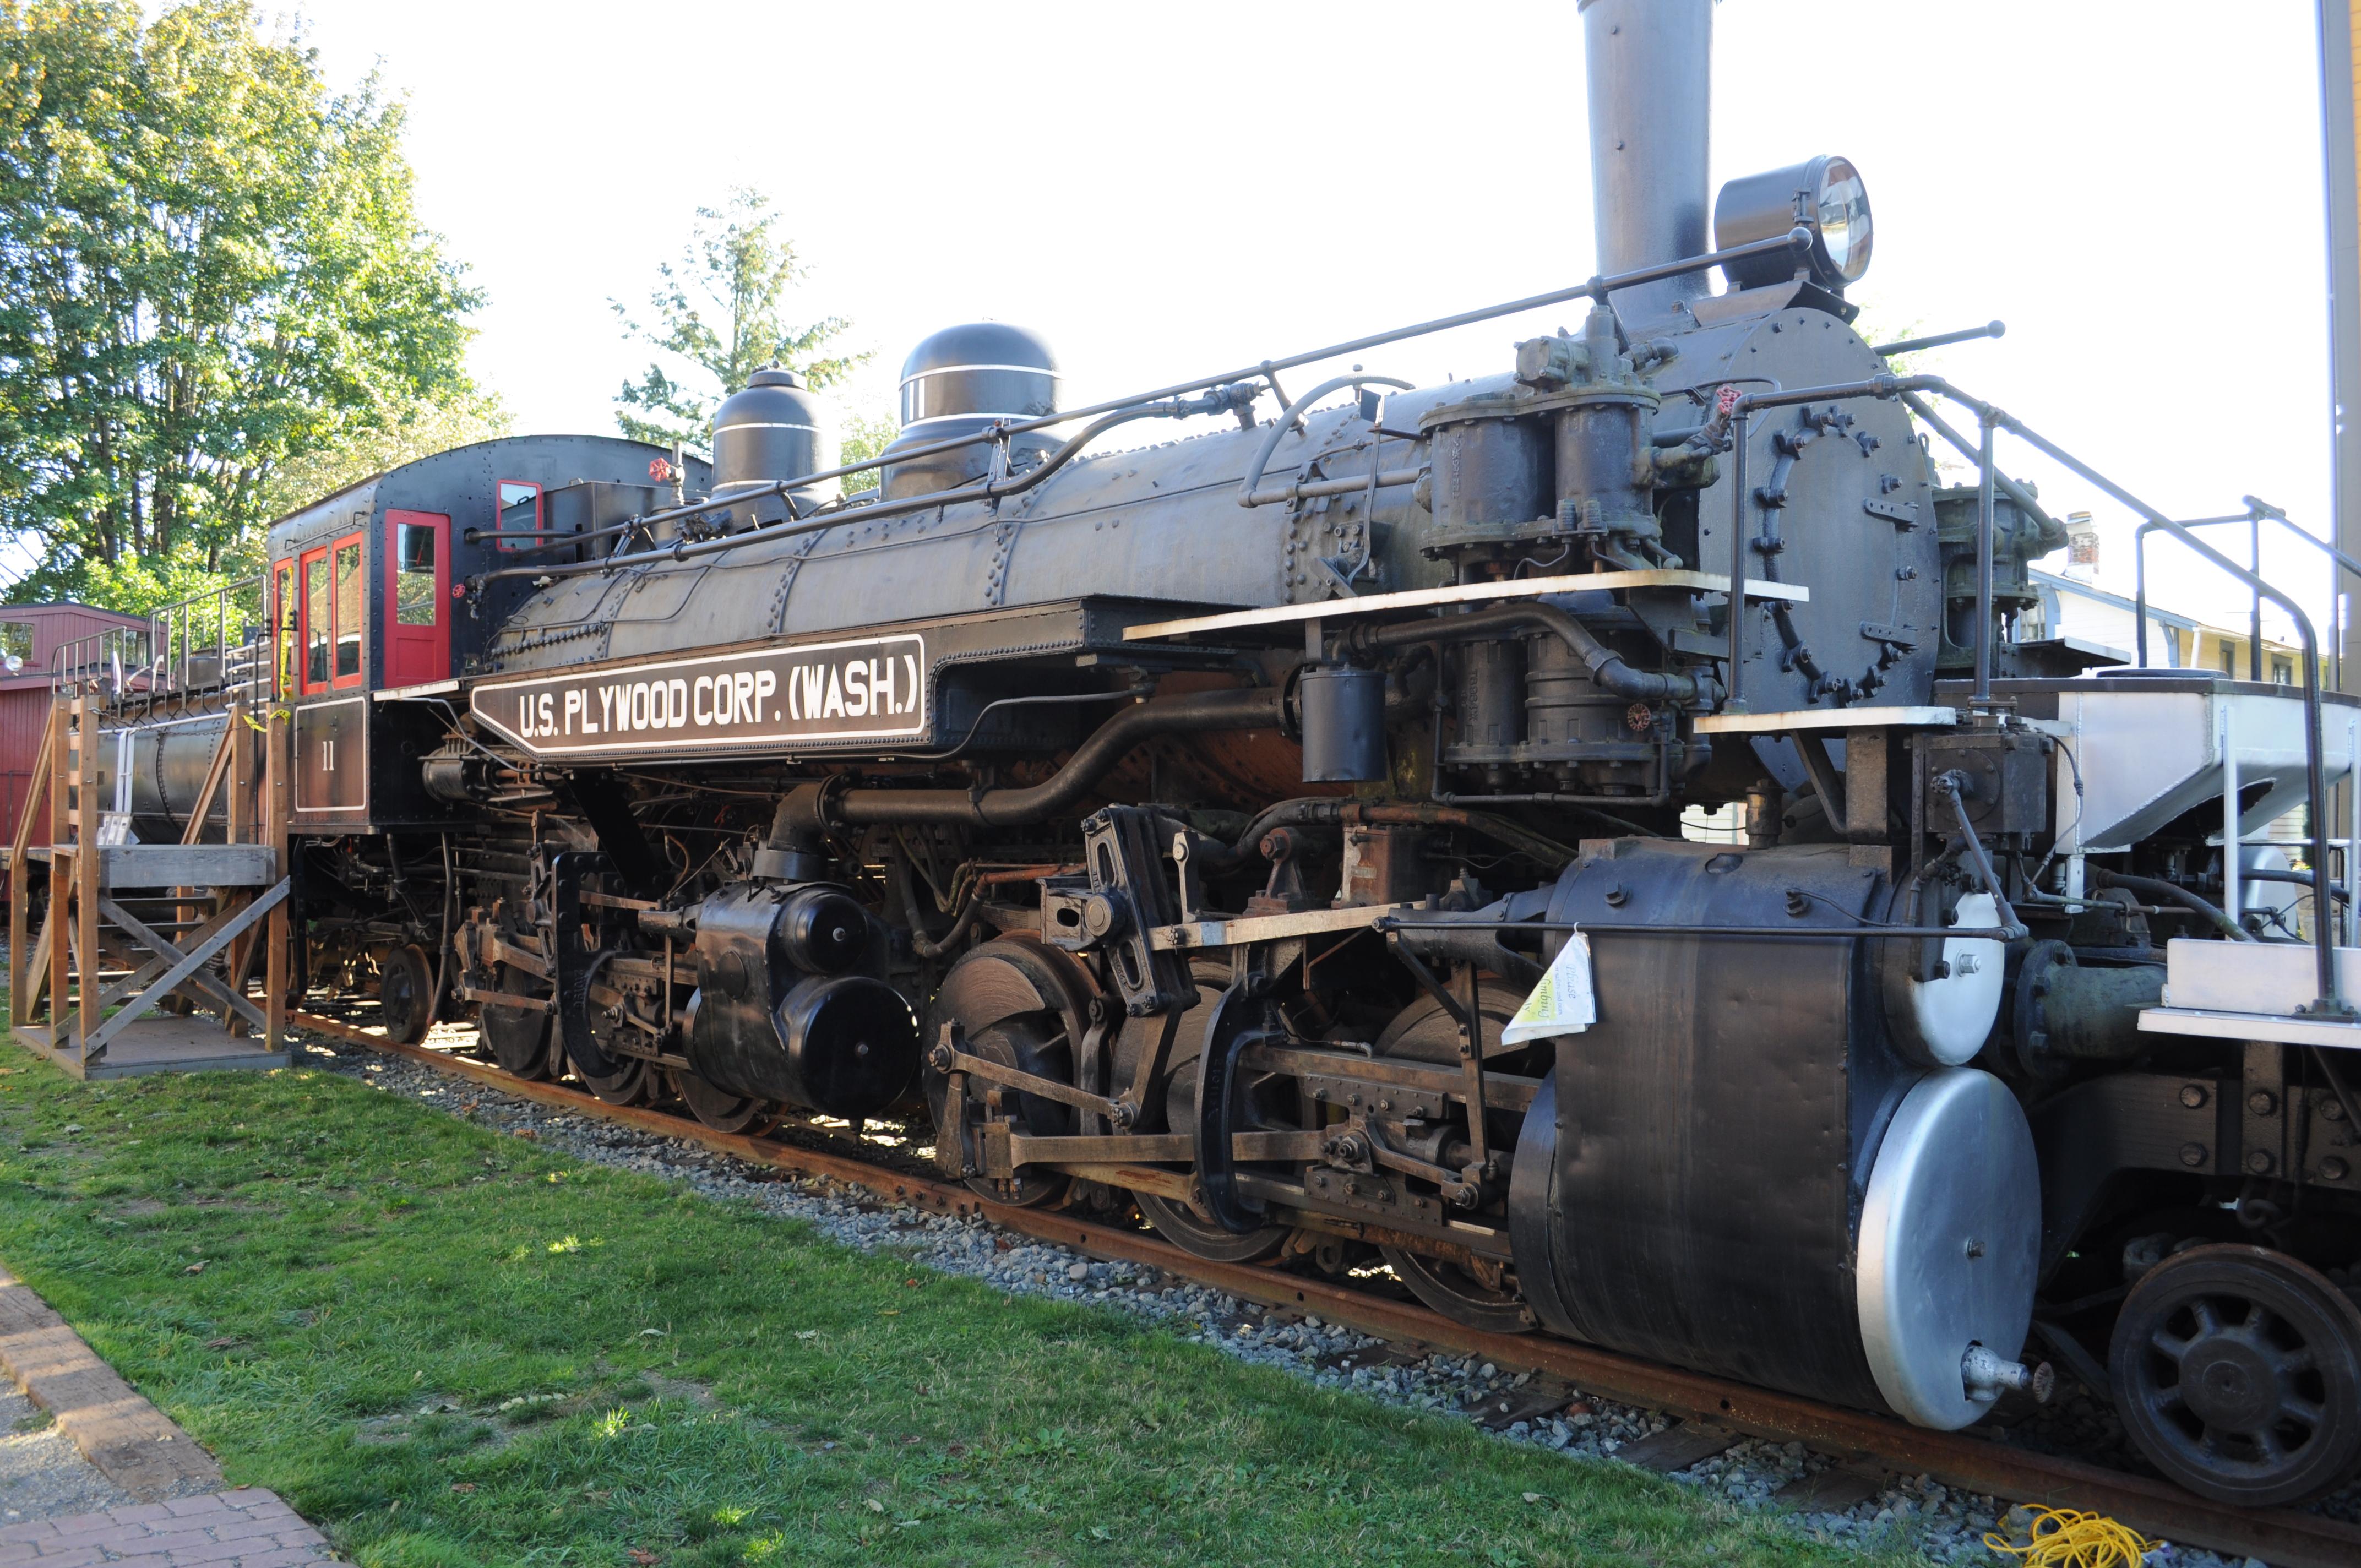 U S Plywood Corporation Locations ~ File u s plywood corp train engine g wikimedia commons